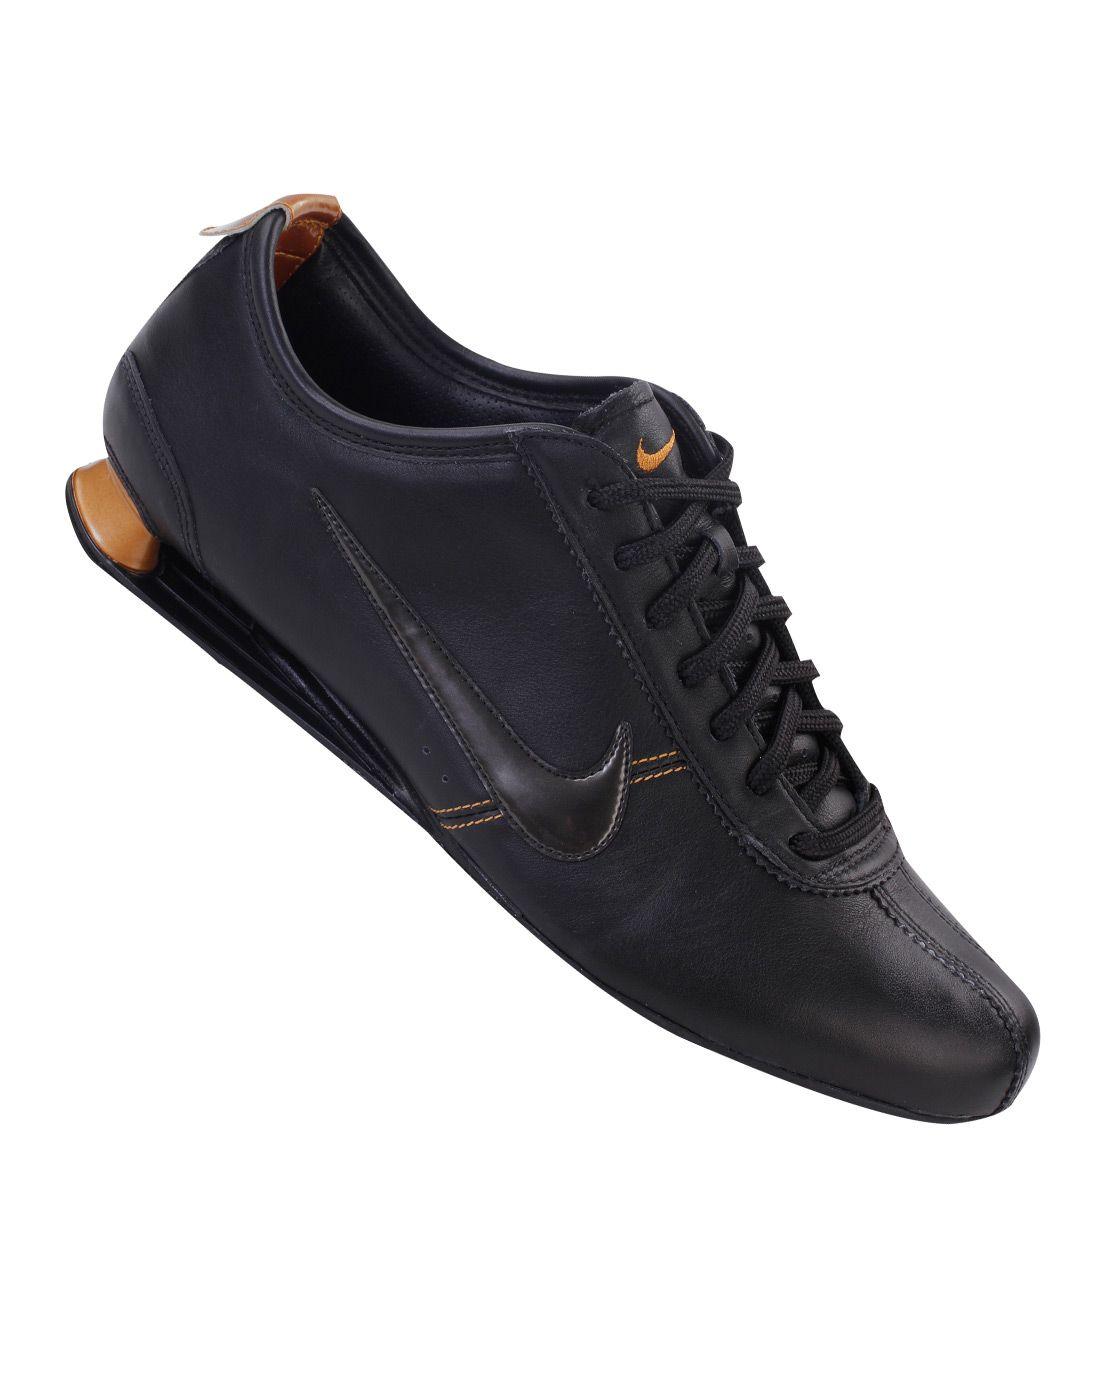 pretty nice 4d2a8 0673a Nike Shox Rivalry Black Black Mtlc Bronze Schuhe Reduziert Bzw